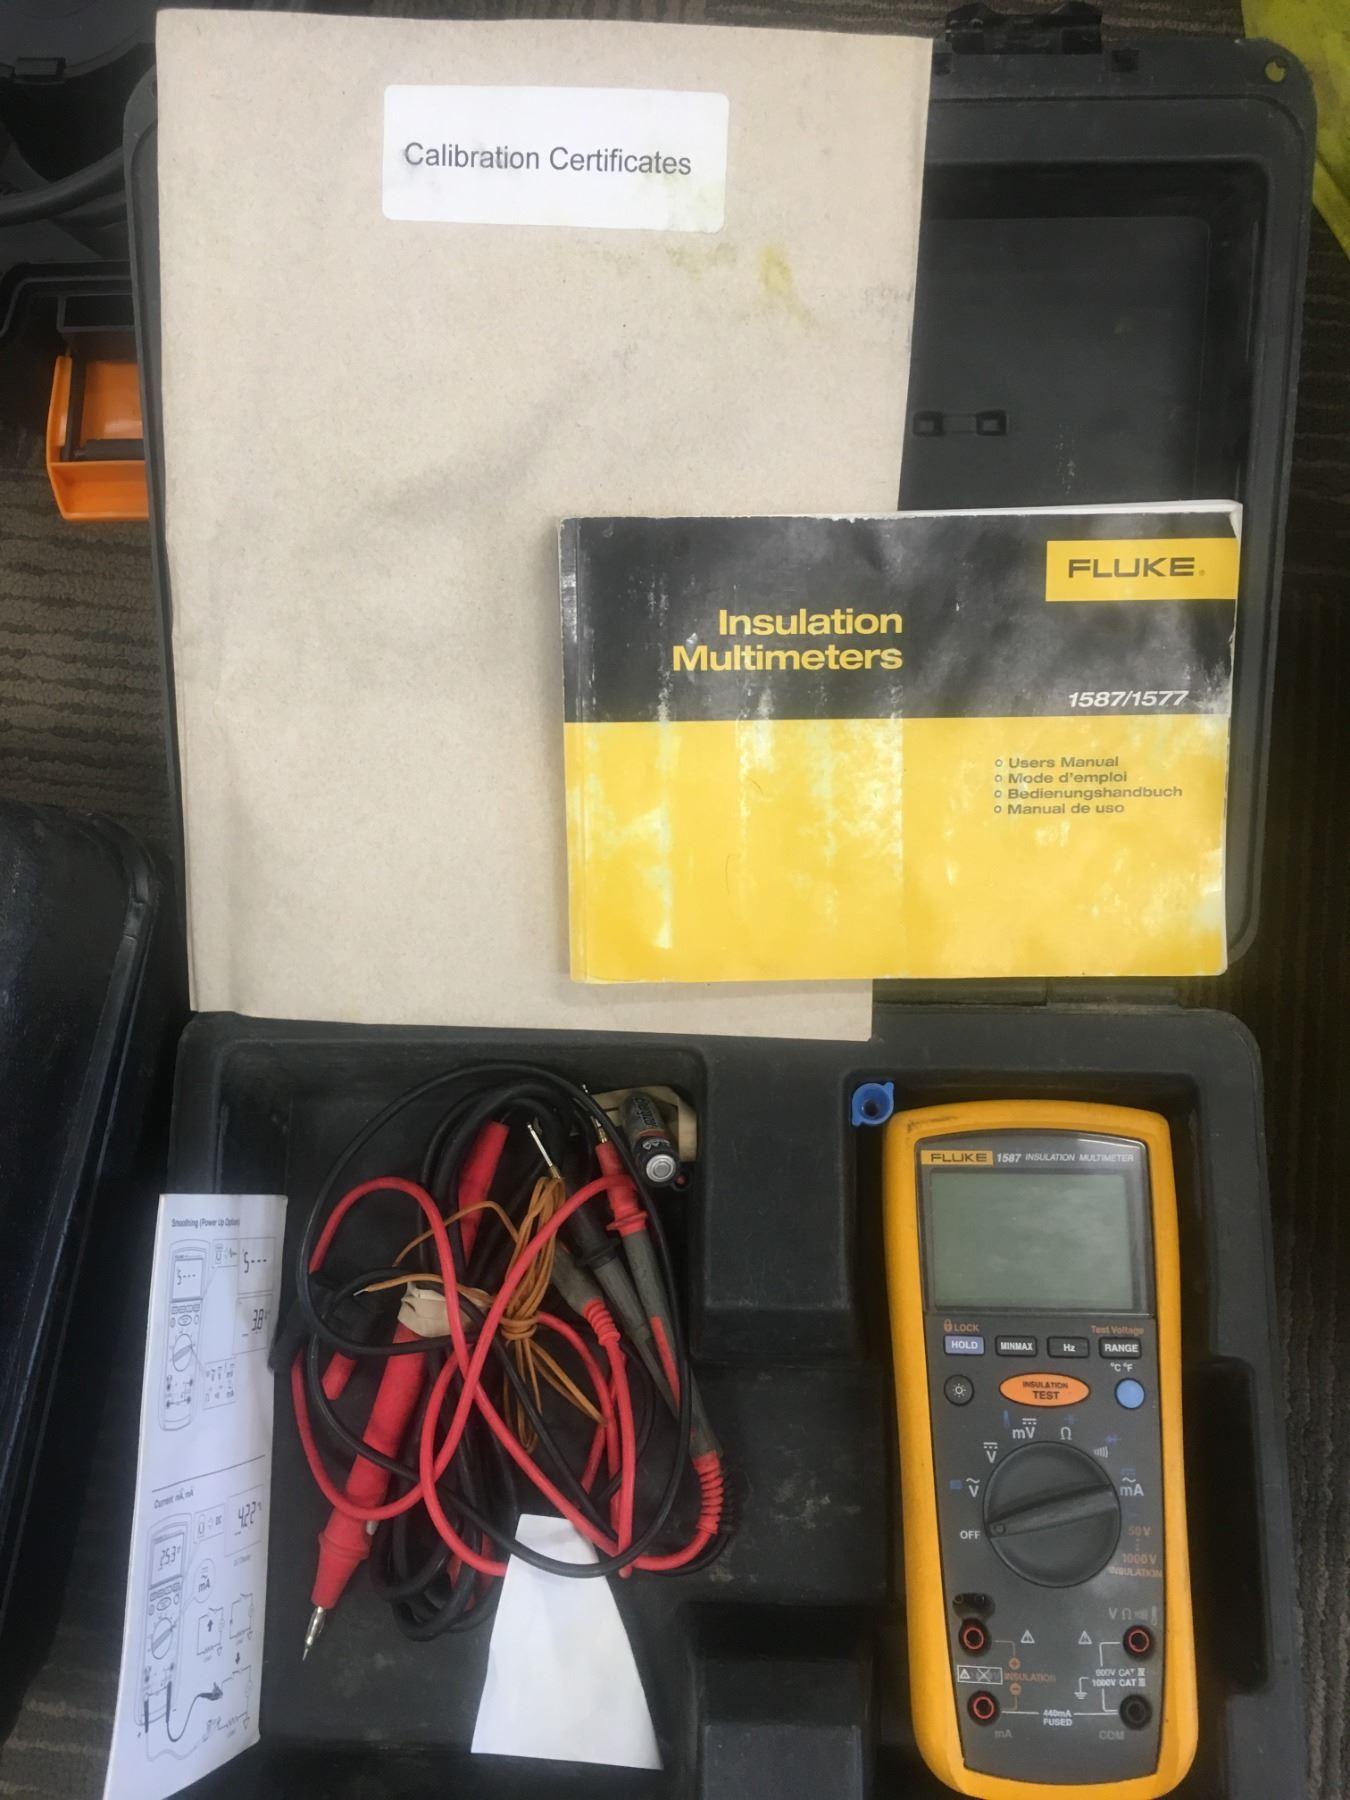 Wire Insulation Tester | Fluke 1587 1577 Insulation Tester